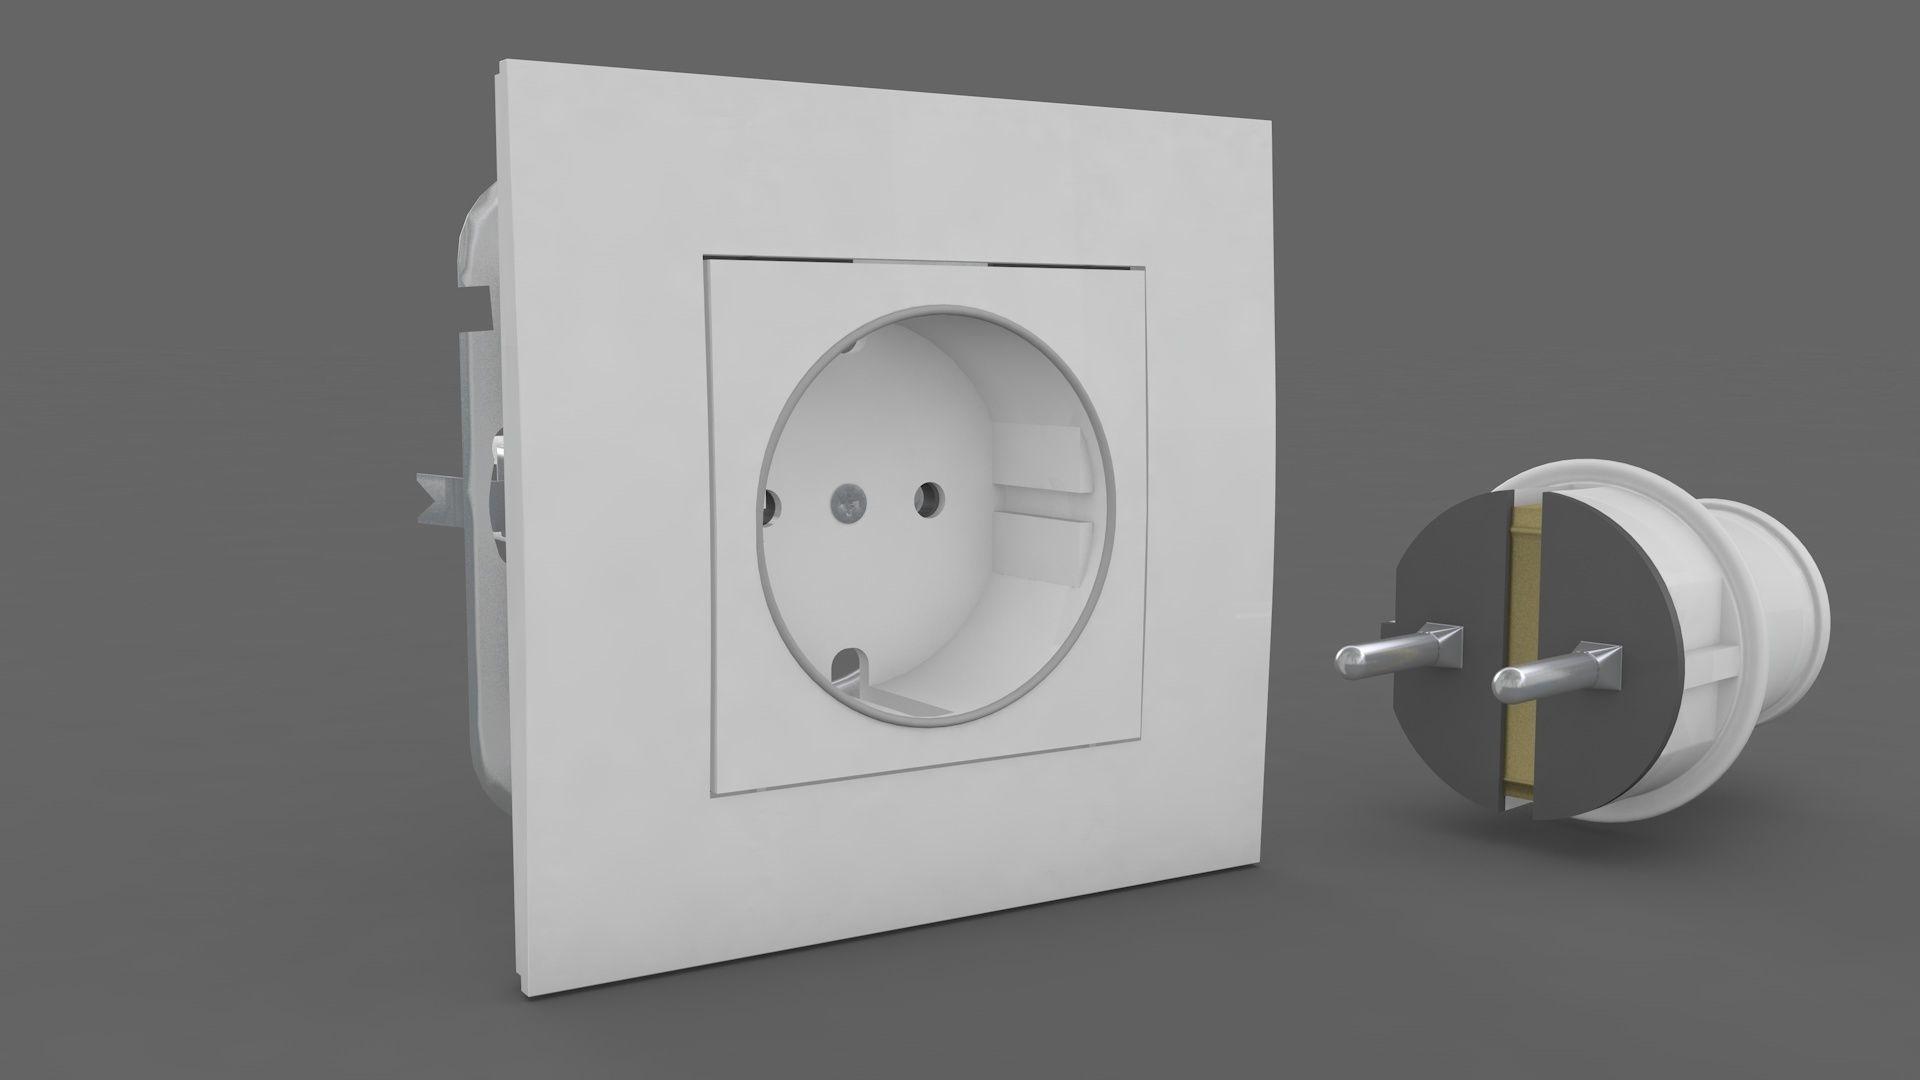 Plug and Socket Detailed